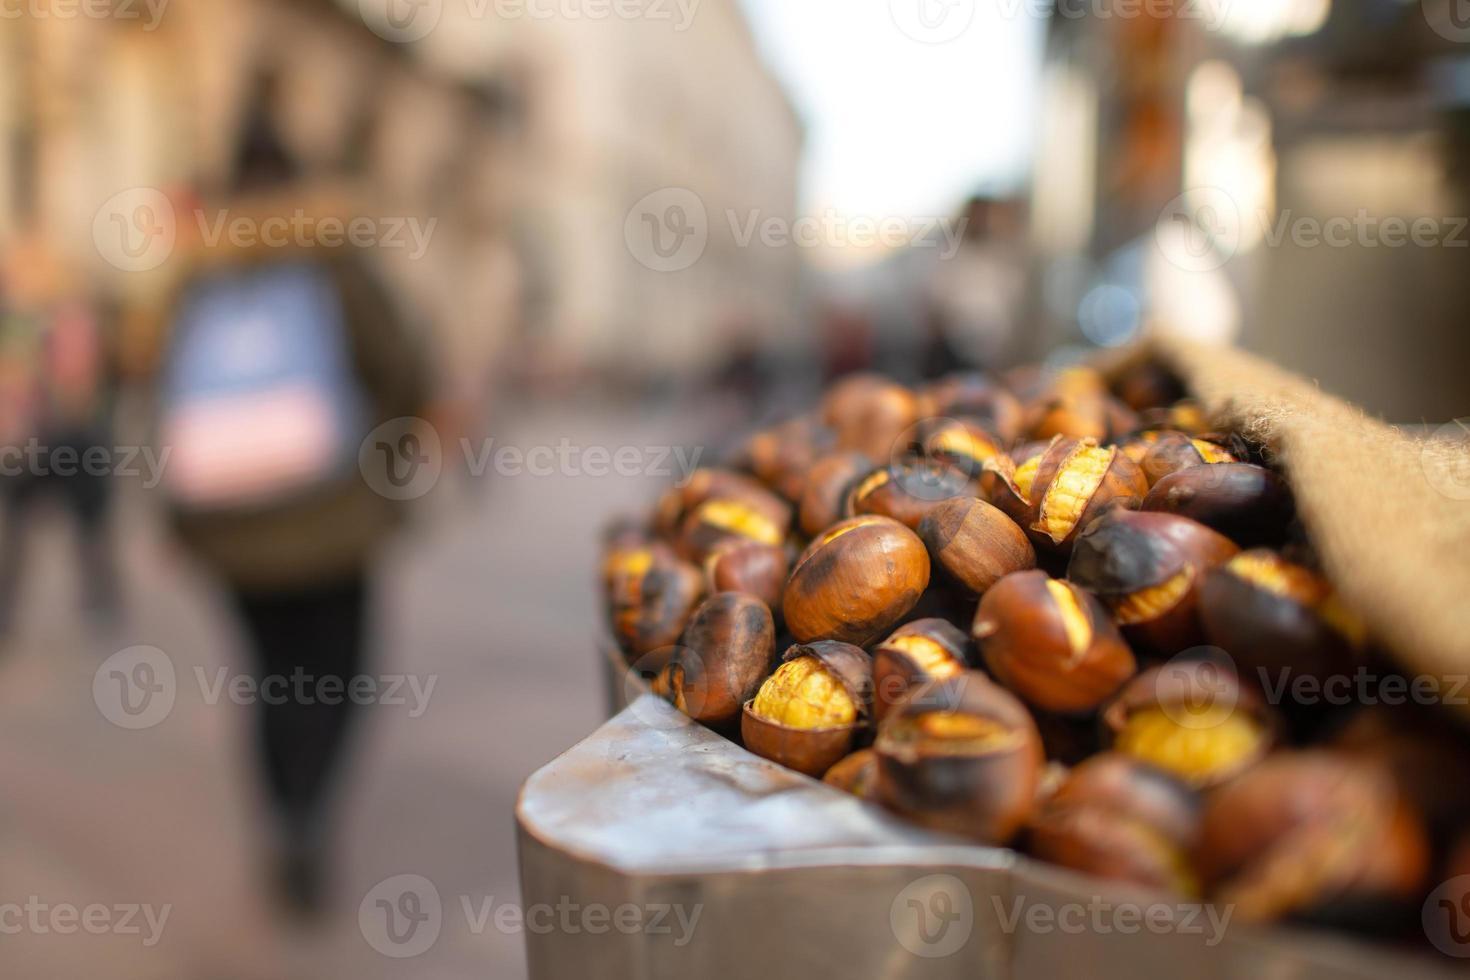 caldarroste in vendita per strada in città in autunno foto